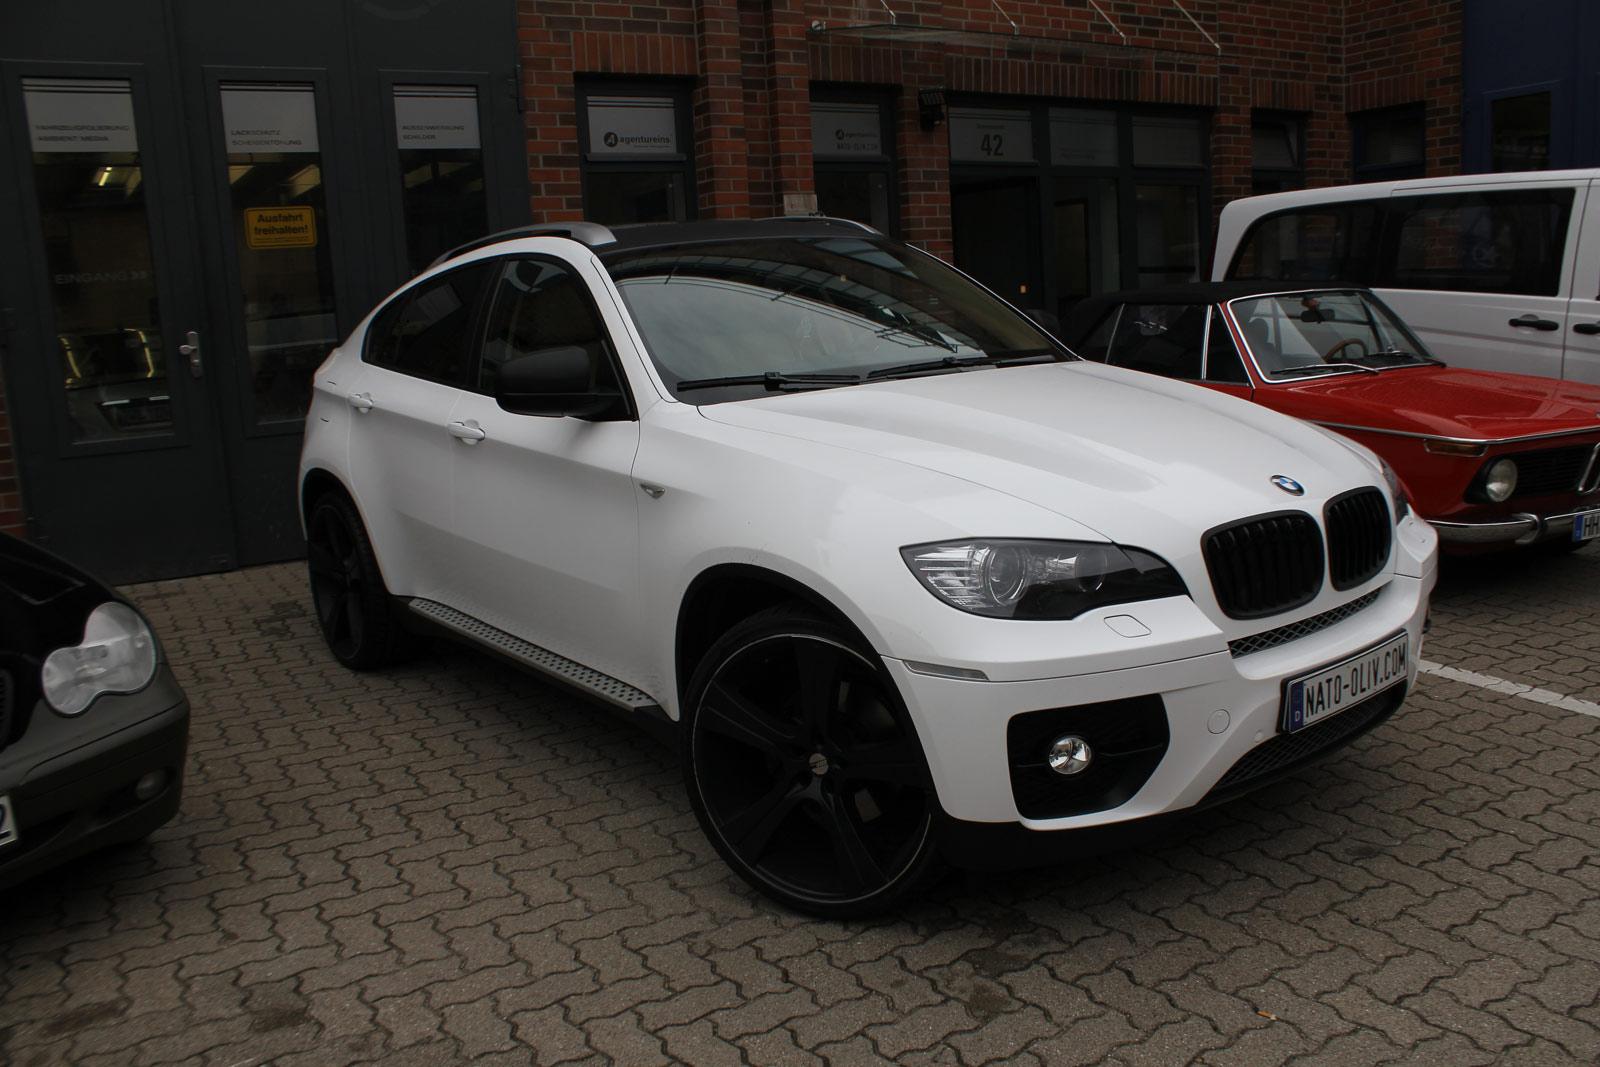 BMW_X6_FOLIERUNG_WEISS_GLANZ_PLUS_CARBON_11